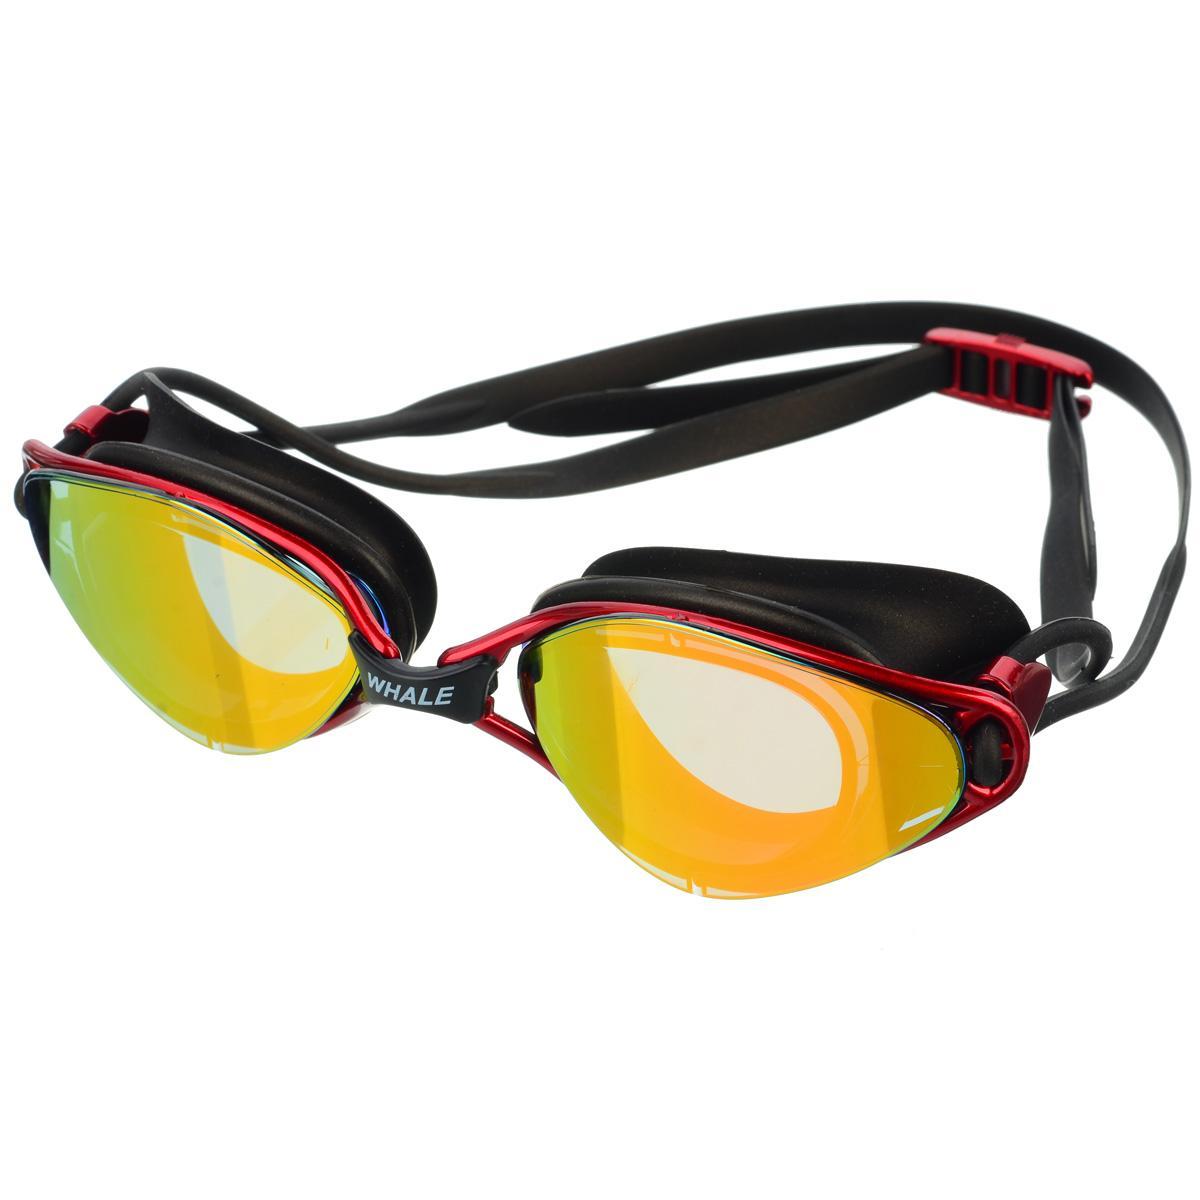 9ddc7481017 Buy General Swiming Goggles at Best Prices Online in Pakistan - daraz.pk